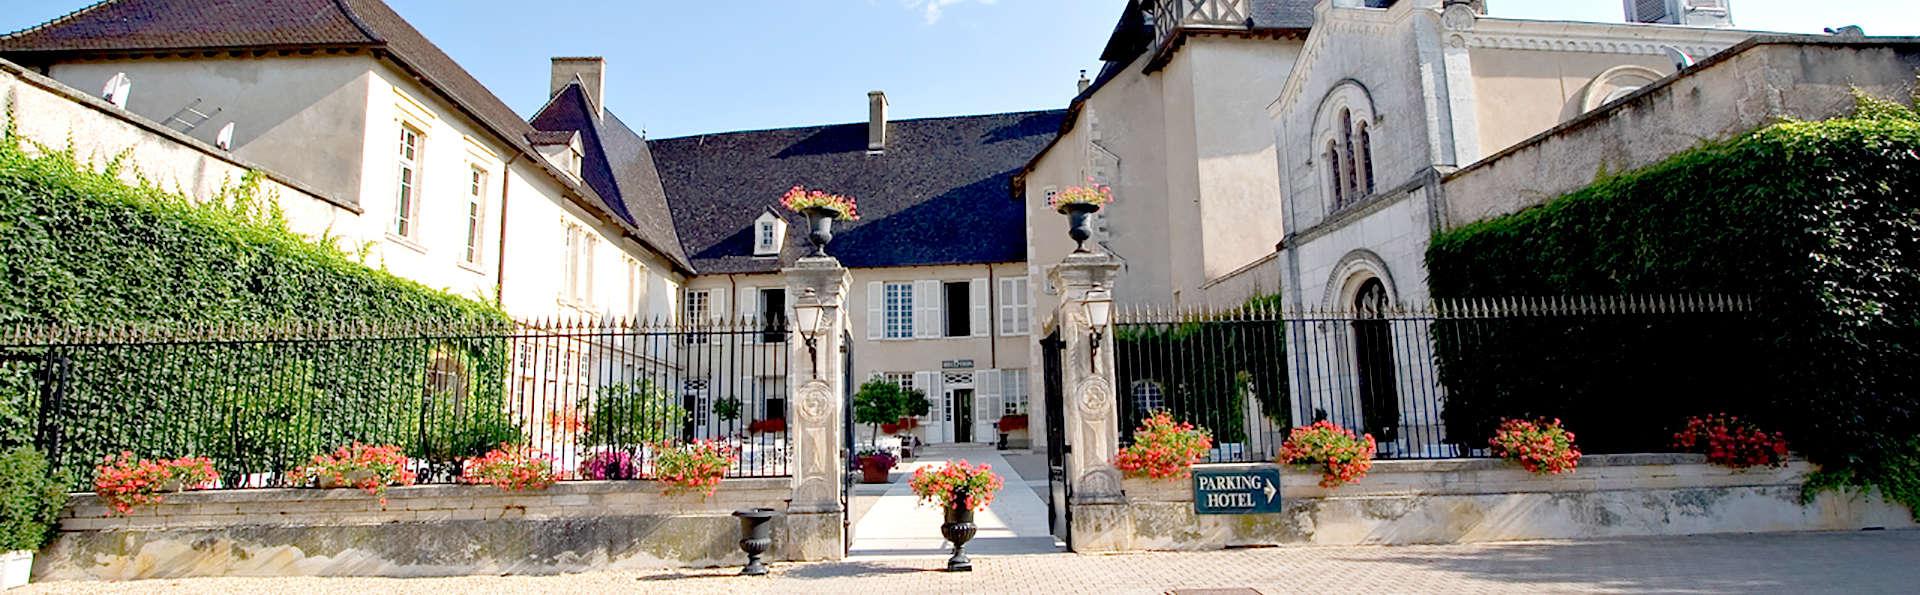 Château de Pizay  - Edit_front2.jpg